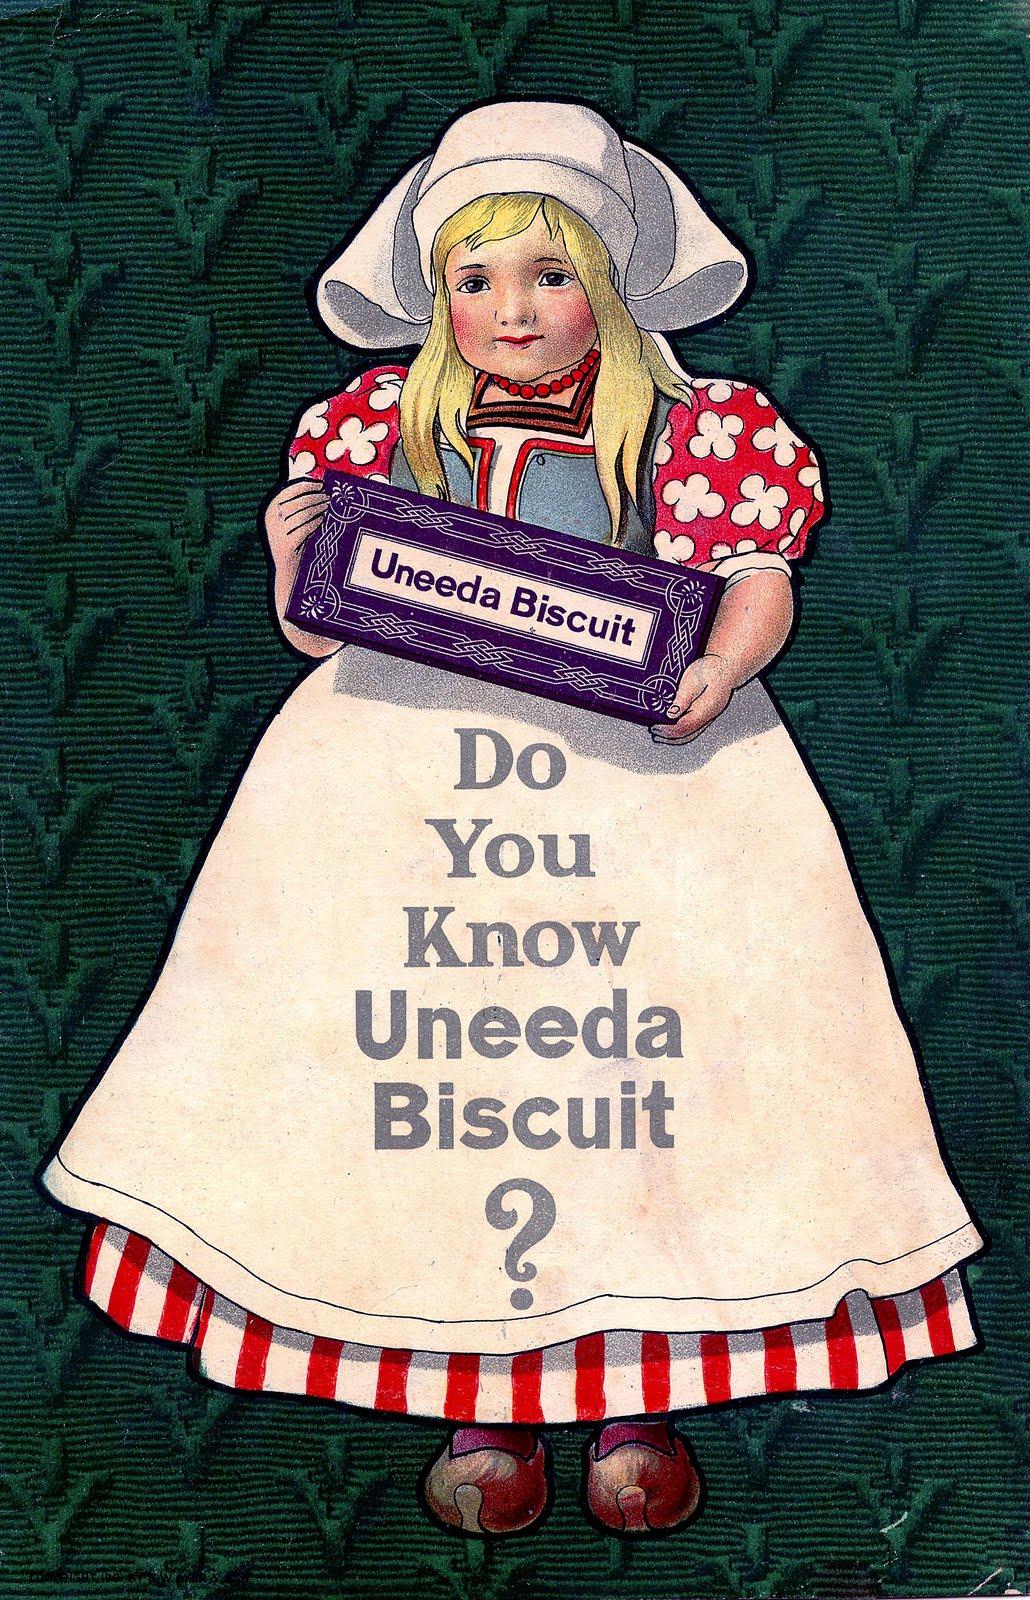 Vintage Advertising Clip Art Darling Dutch Girl The